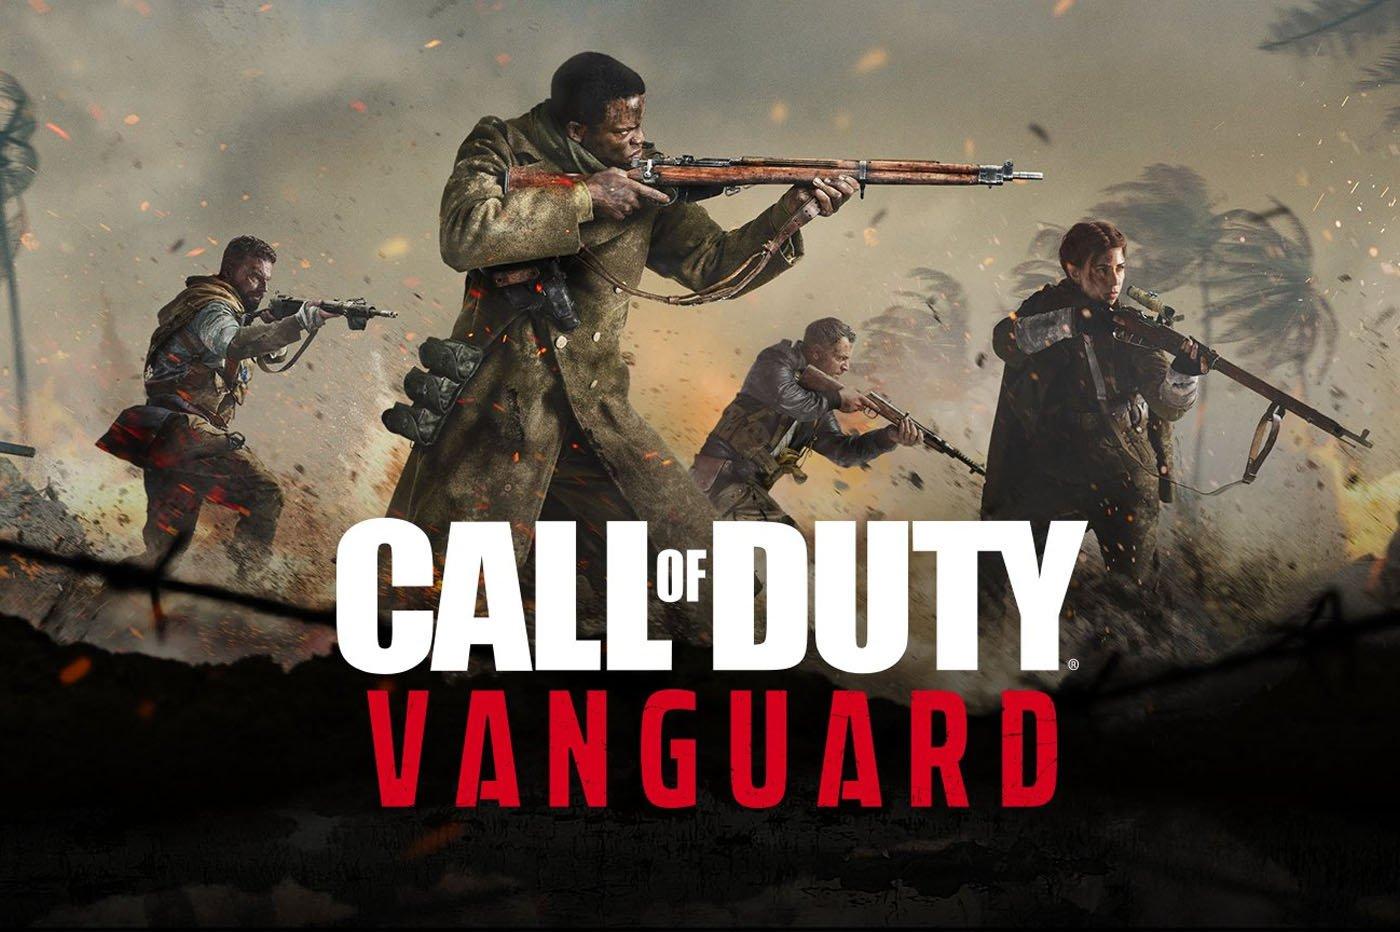 «Call of Duty: Vanguard» obtient la date de sortie officielle 1